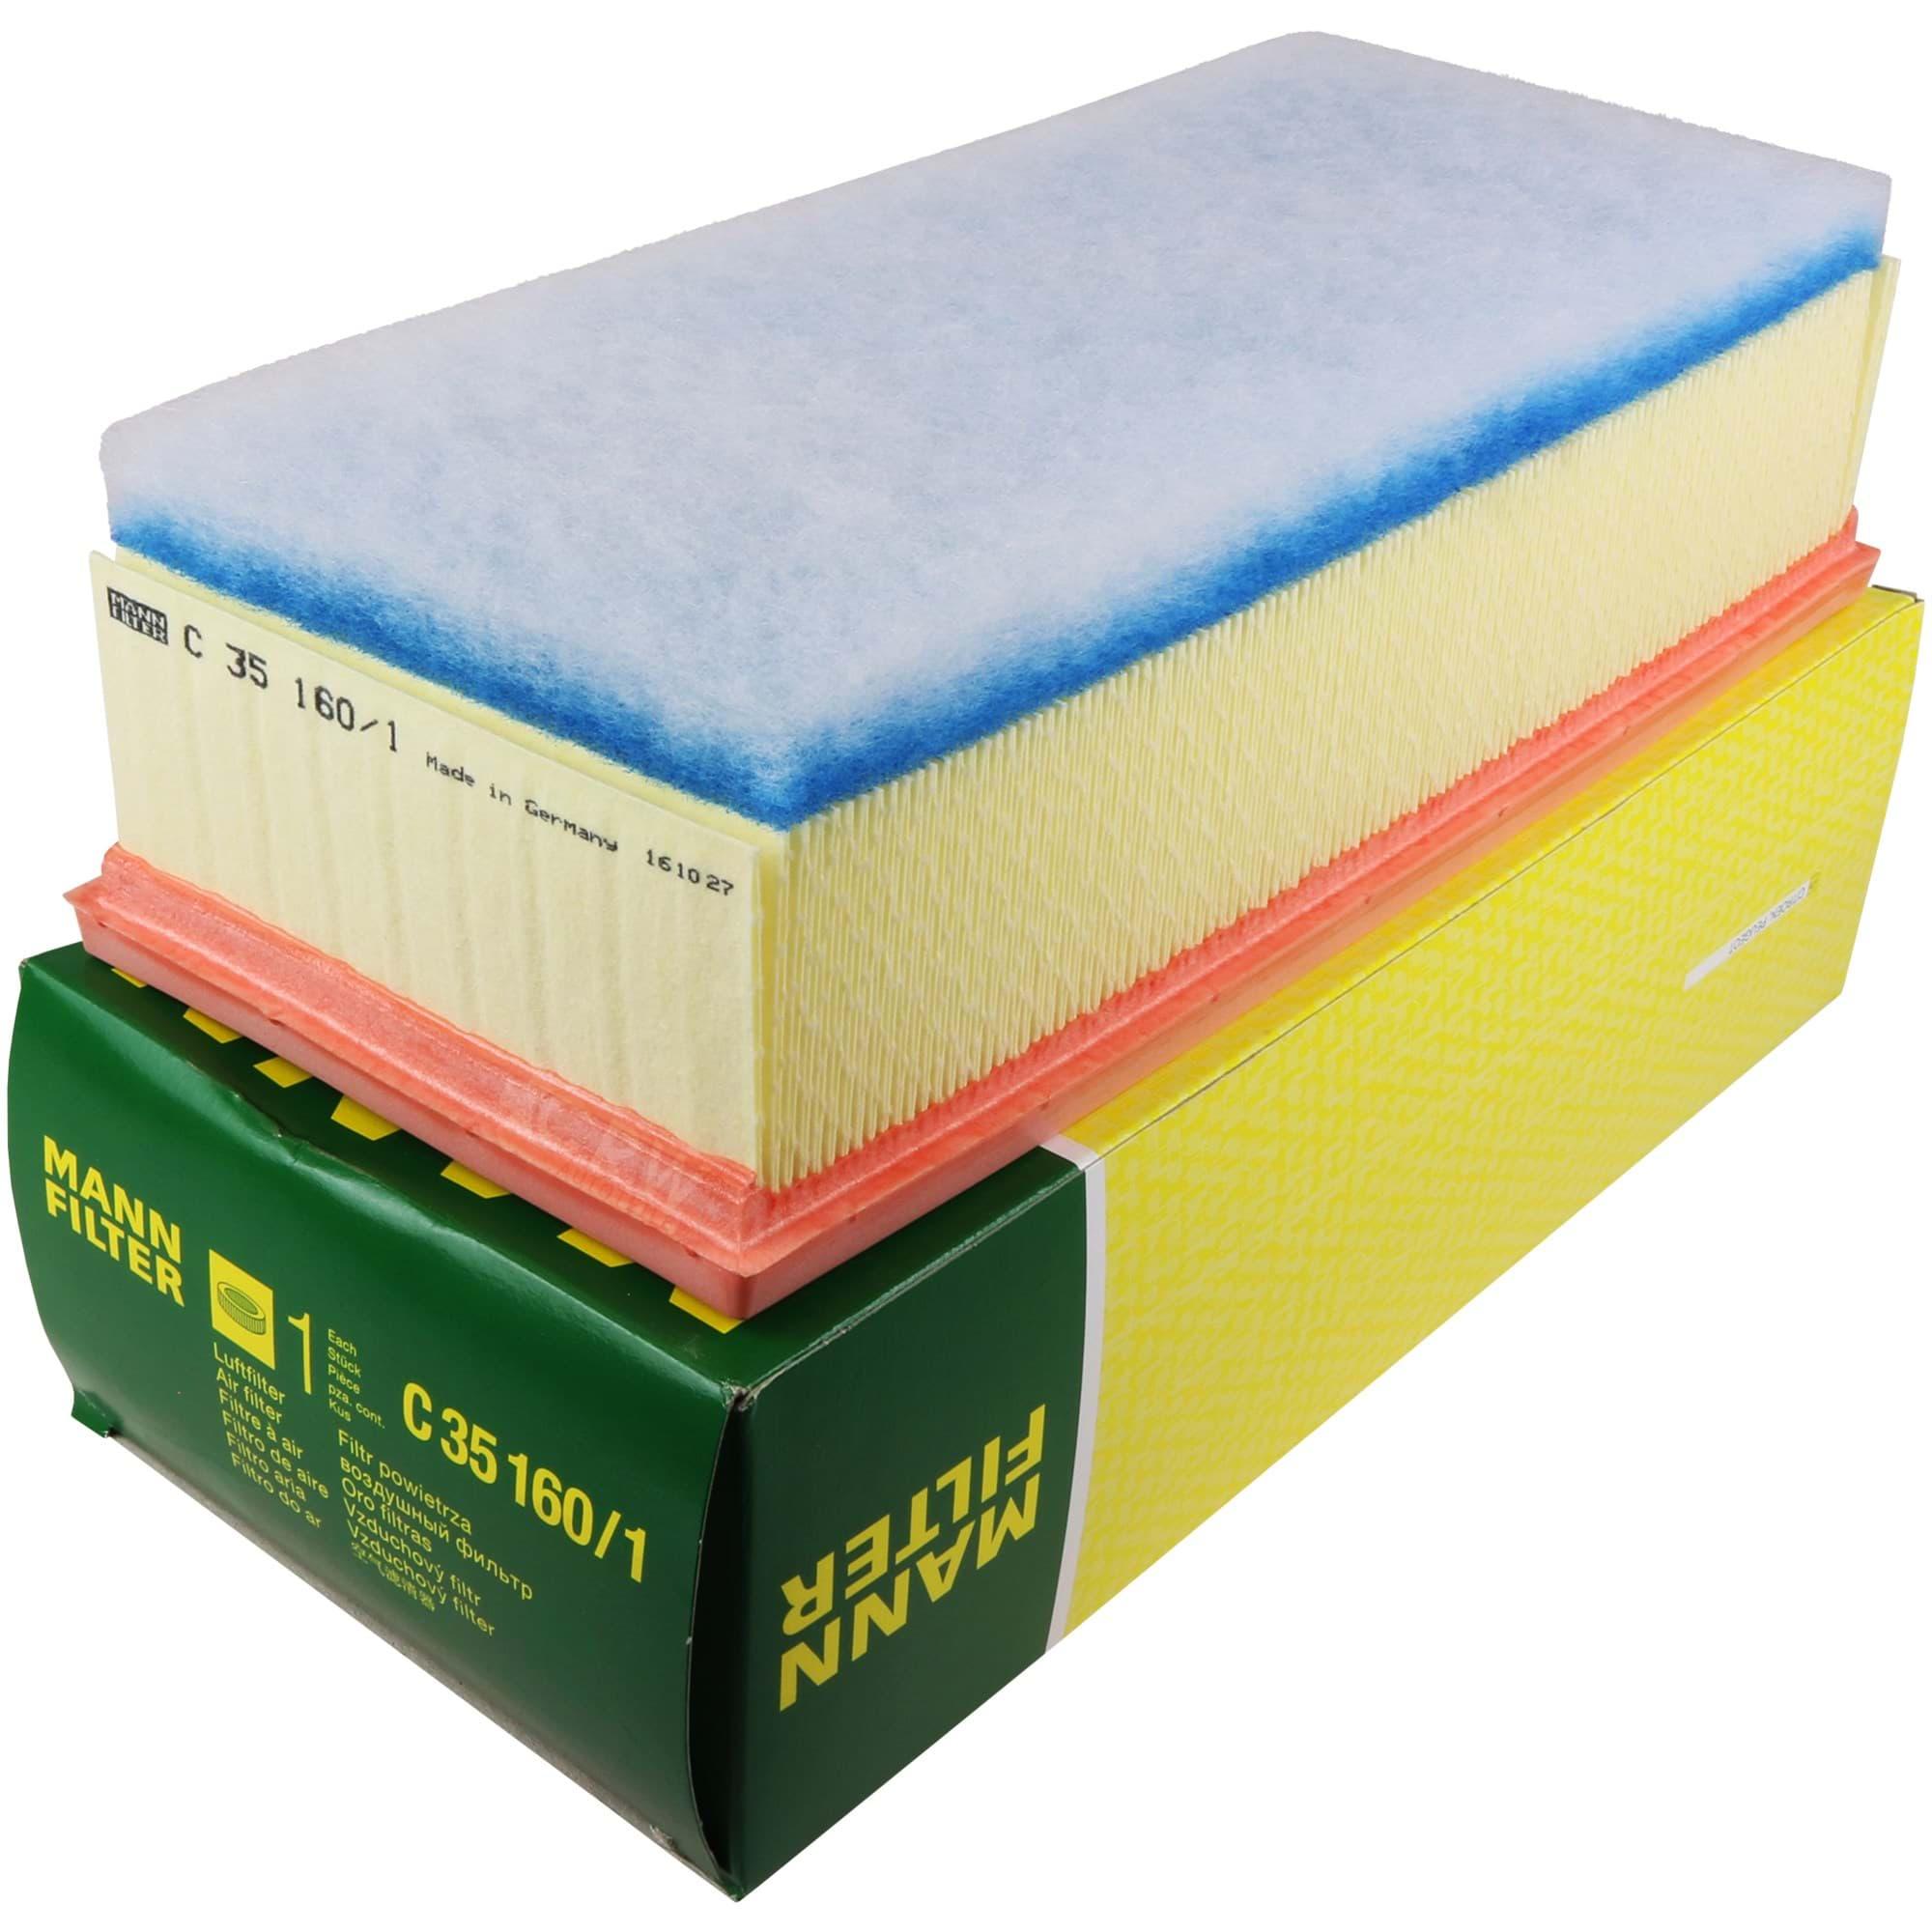 C 35 160//1 Luftfilter Filter MANN-FILTER